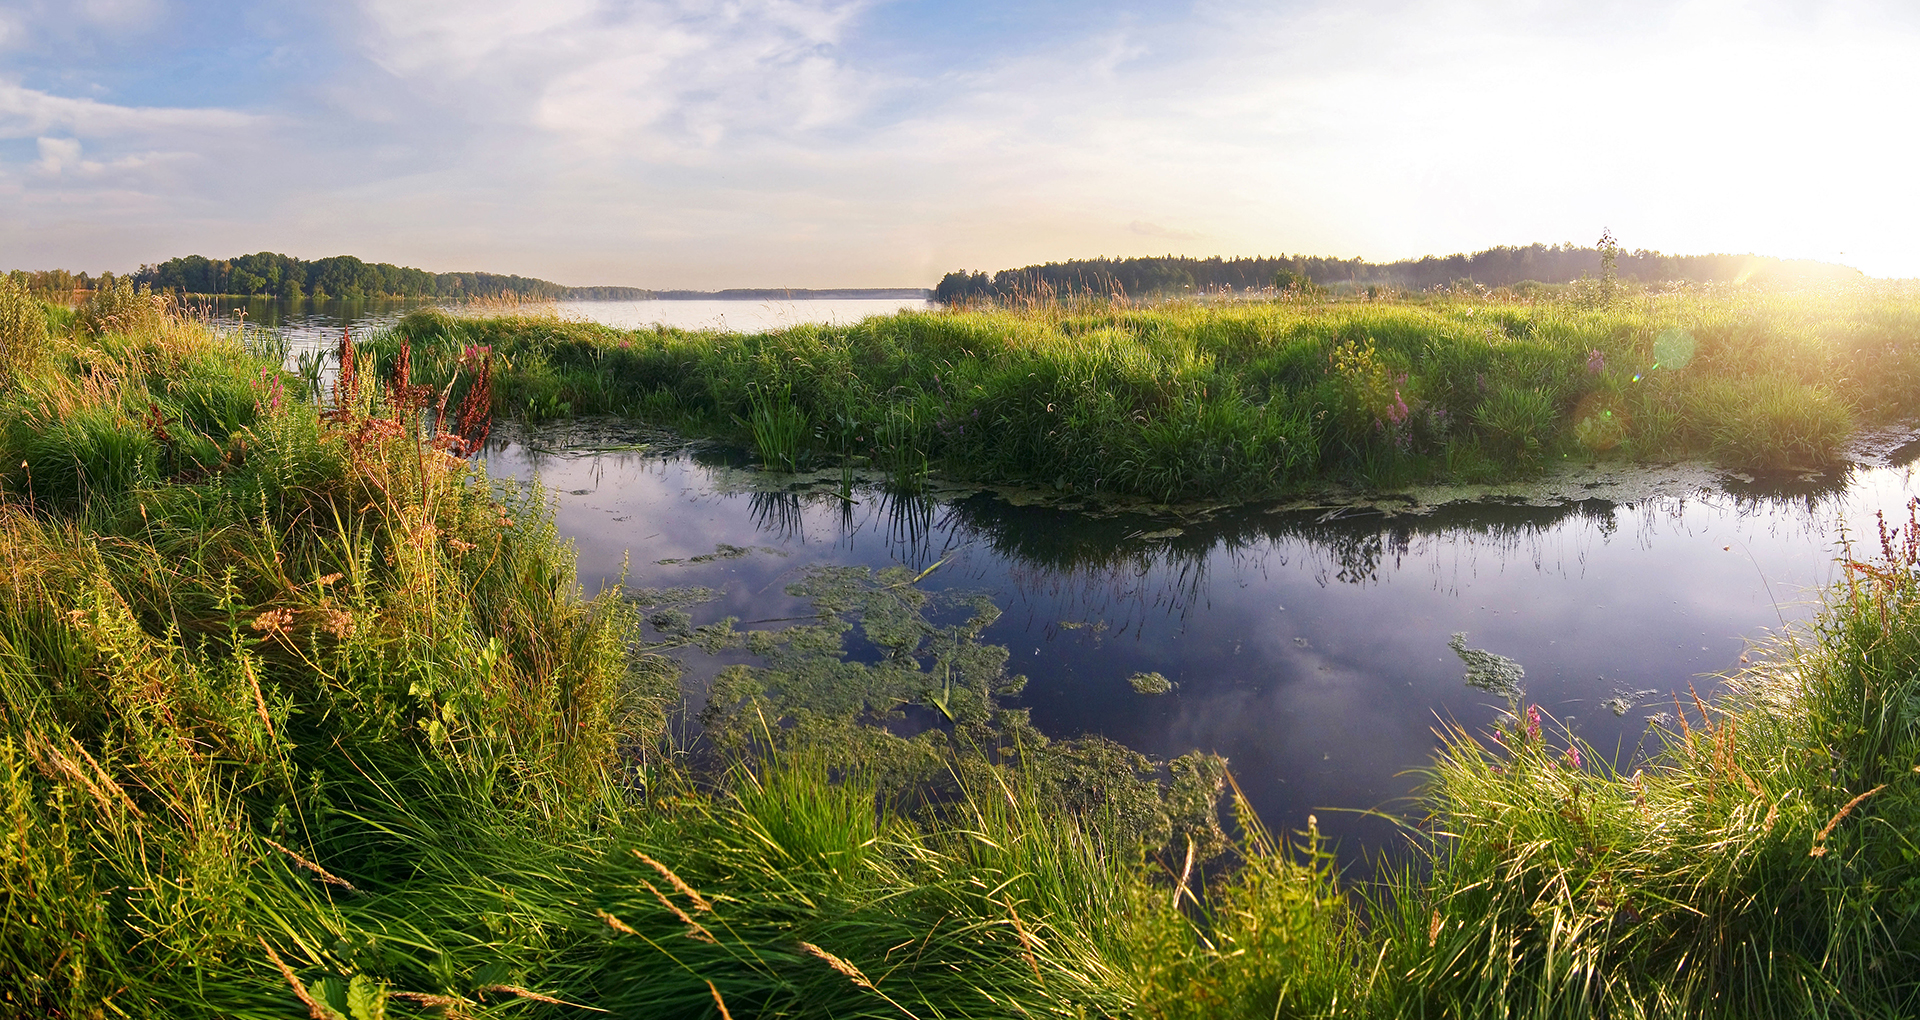 A wetland at sunset.